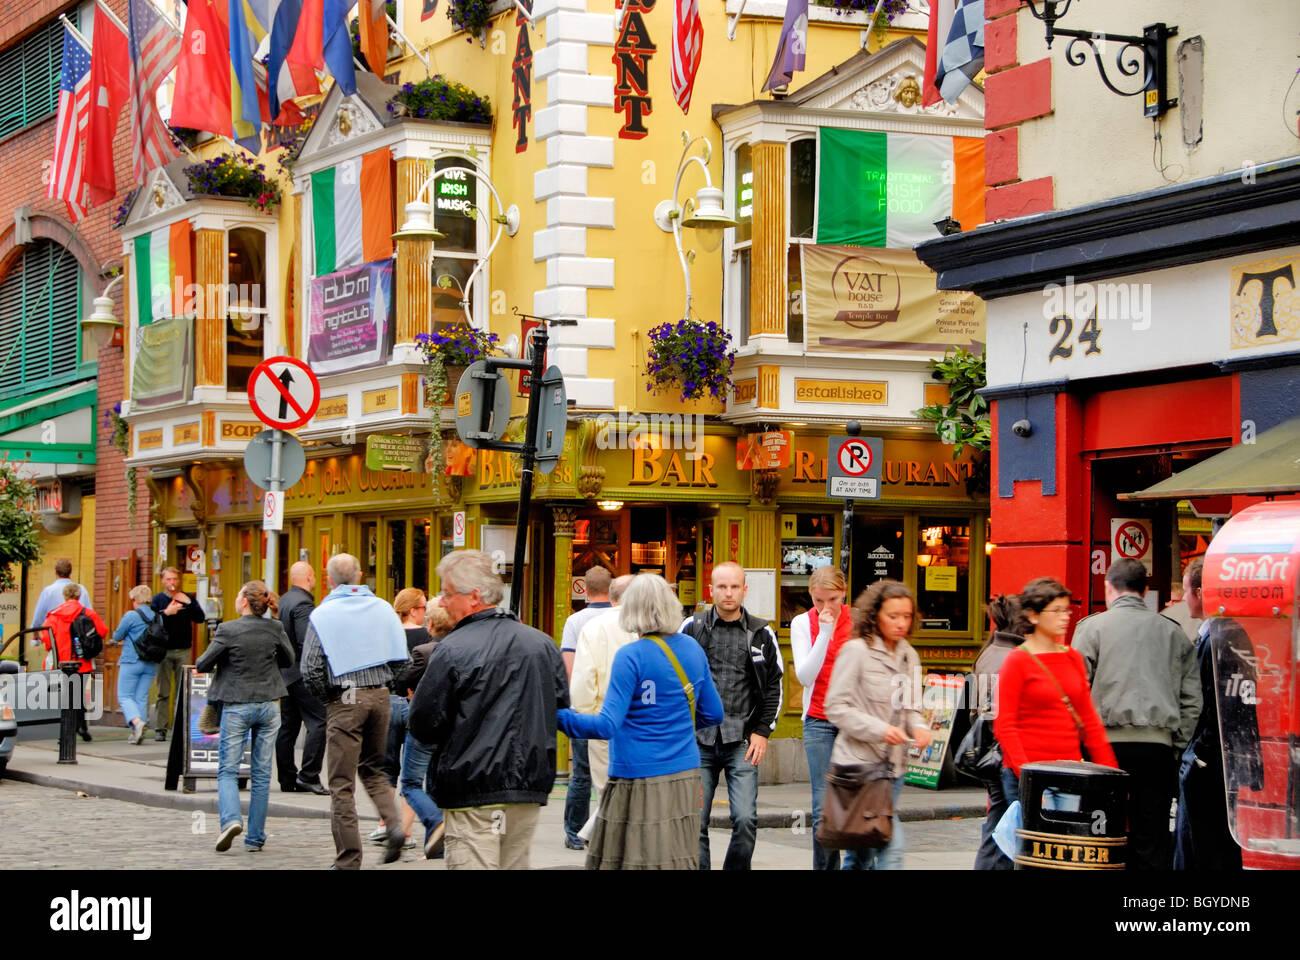 Temple Bar Street Dublin Ireland. - Stock Image